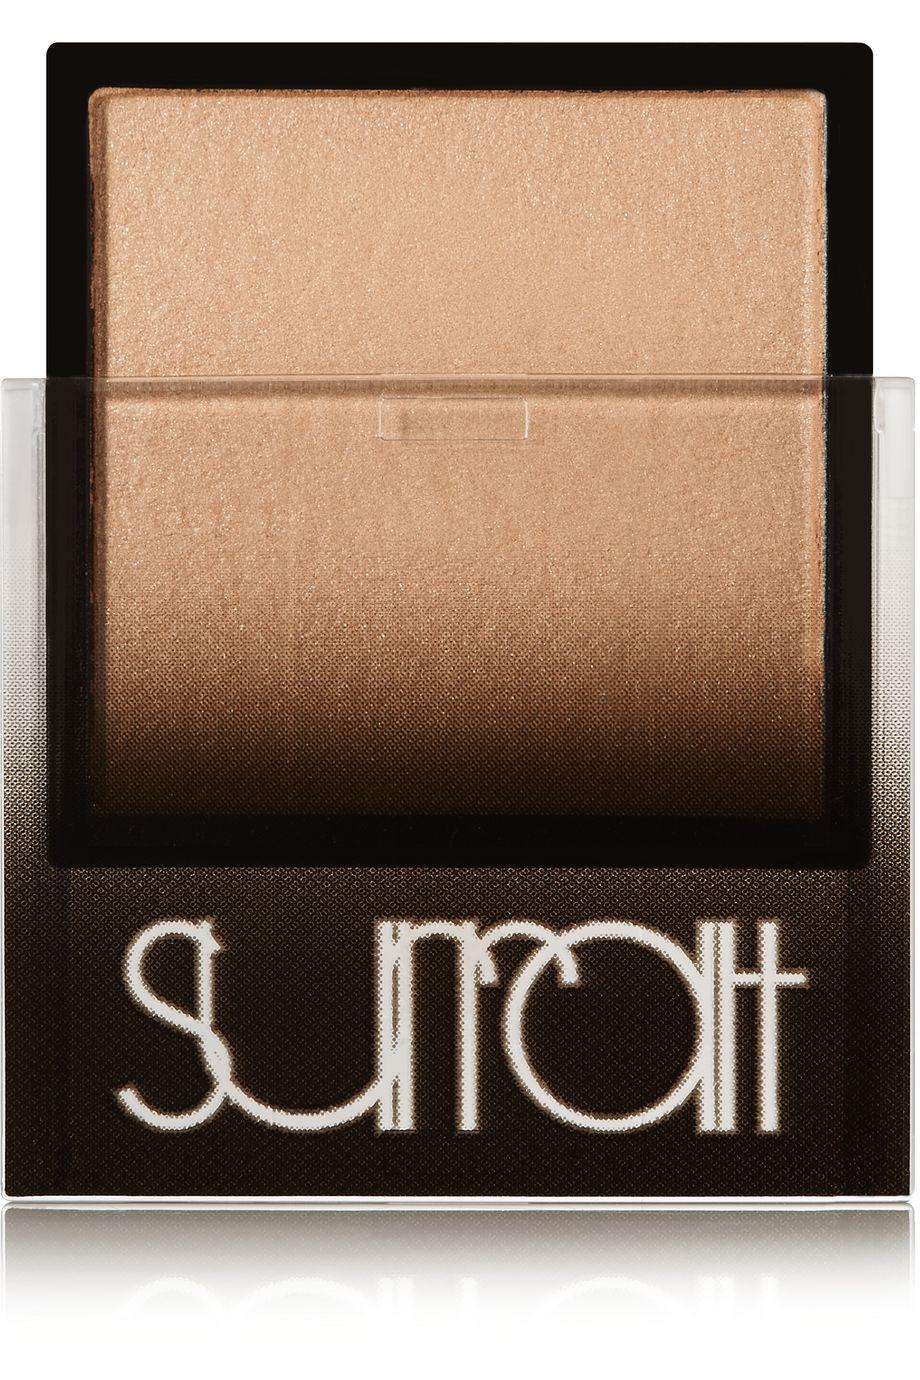 Surratt Beauty Artistique Eyeshadow – Chamois 3 – Lidschatten